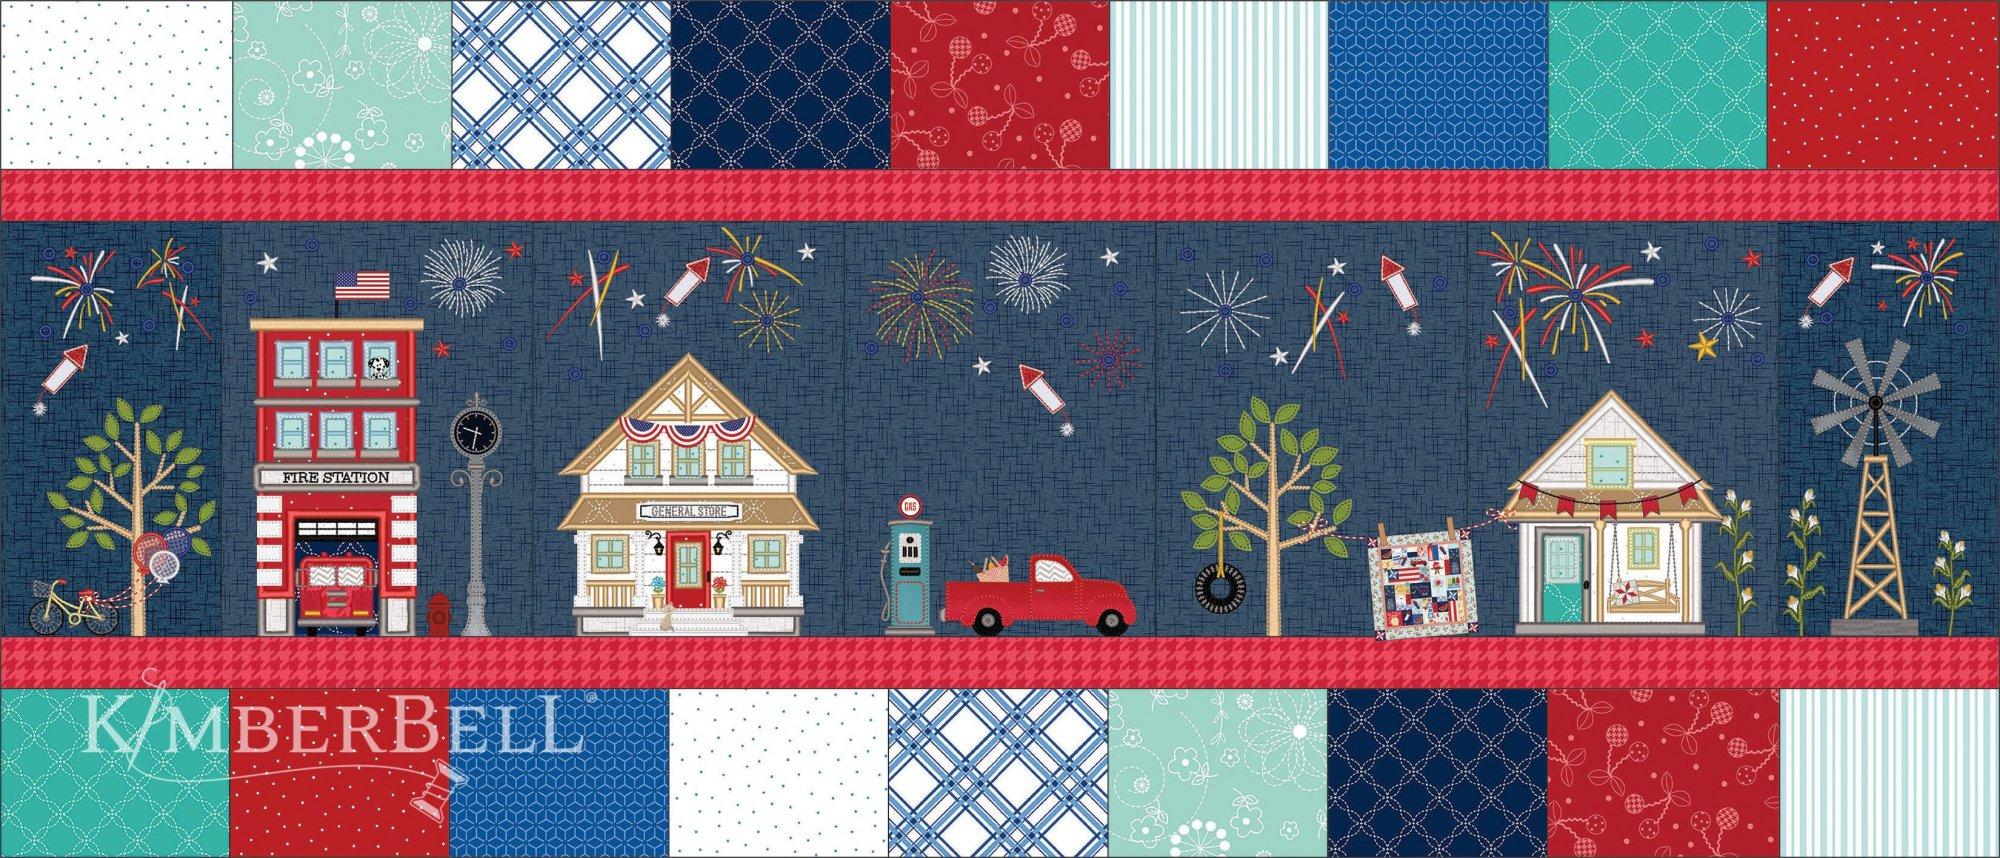 Main Street Celebration Bench Pillow Kit with Embellishment Pack